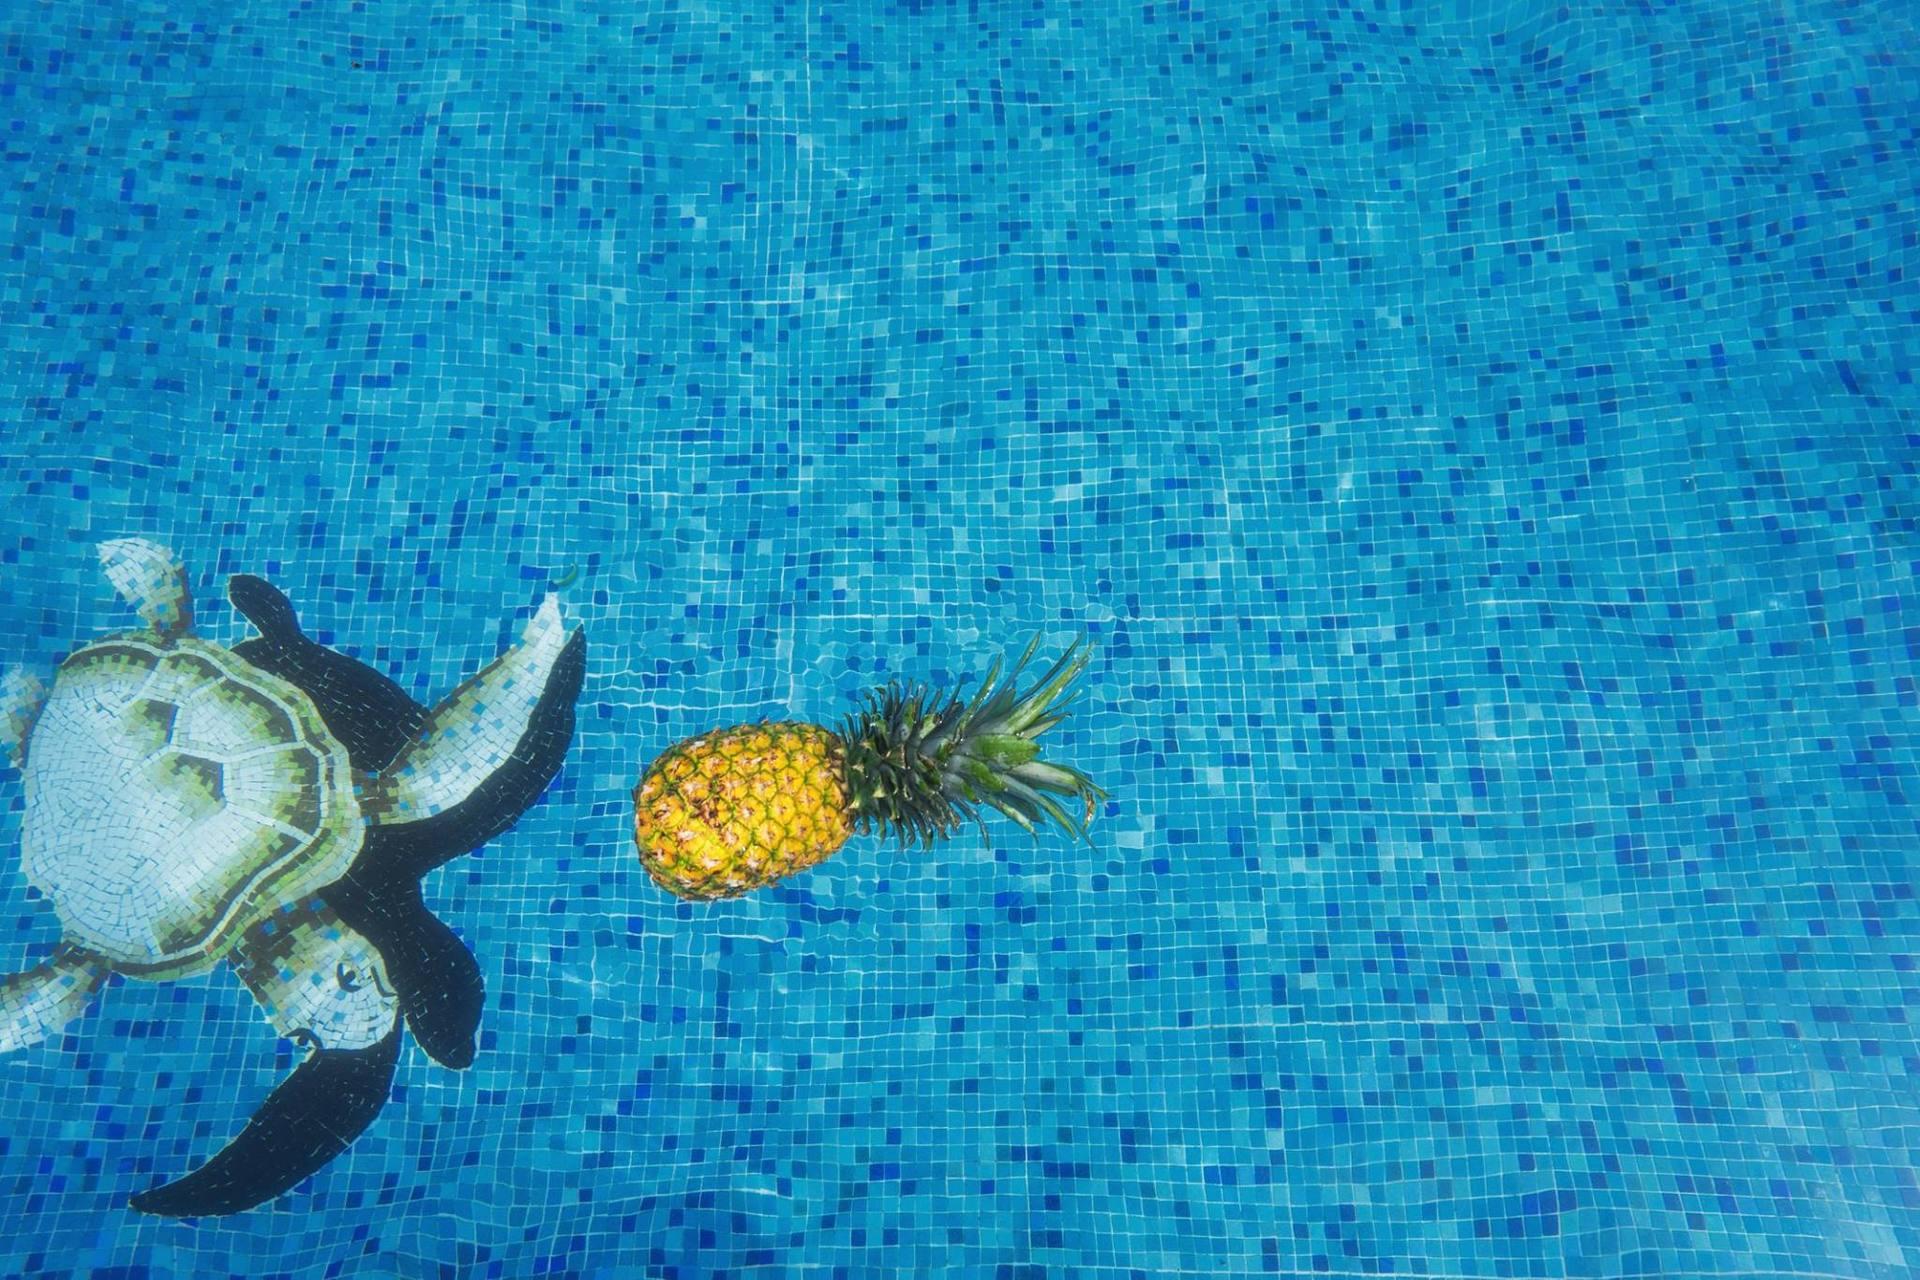 piscina con tartaruga